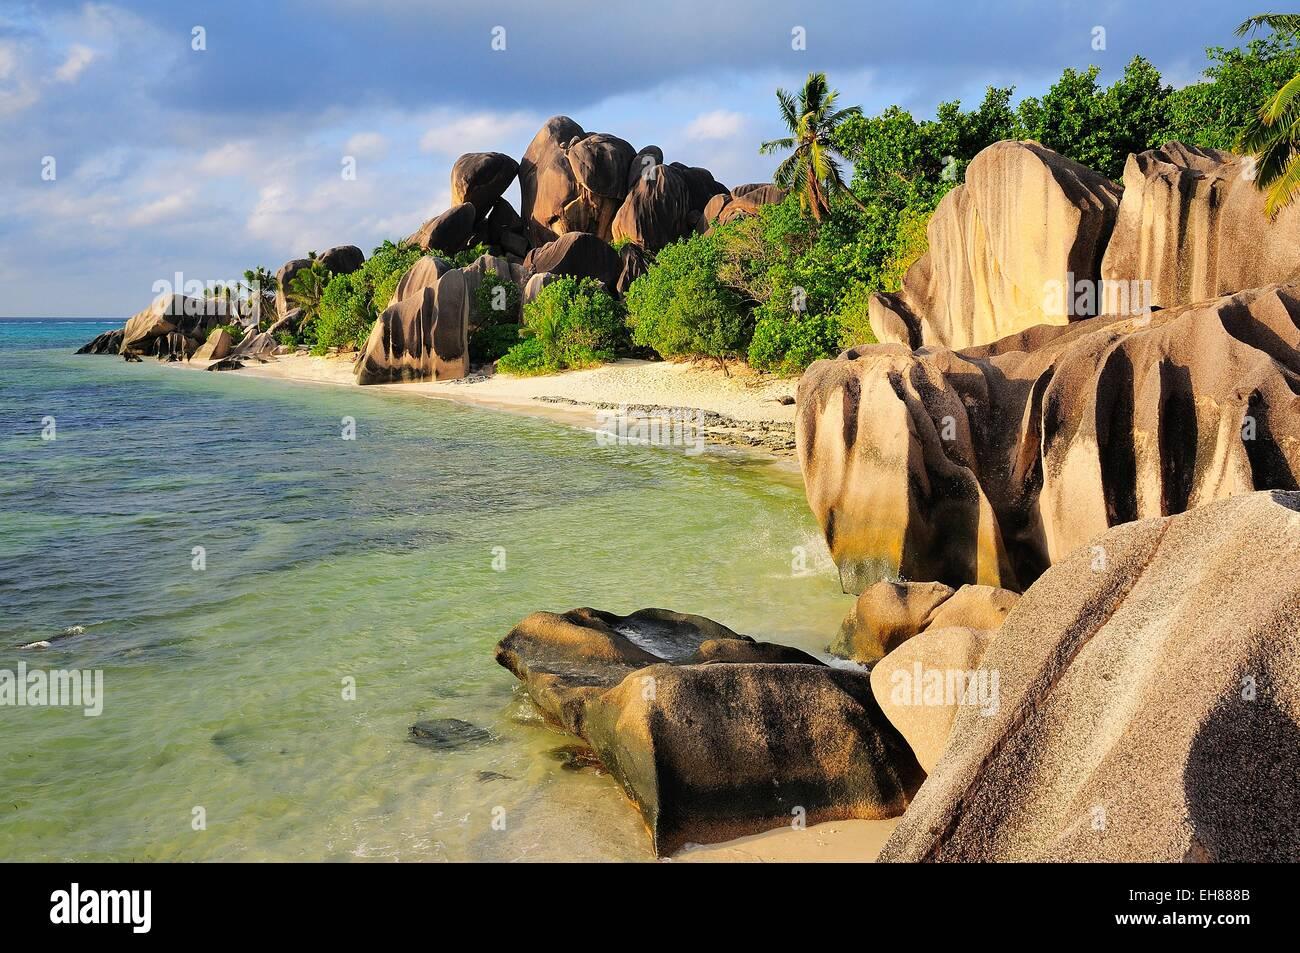 Granite rocks on Anse Source d'Argent beach, La Digue Island, La Digue and Inner Islands, Seychelles - Stock Image